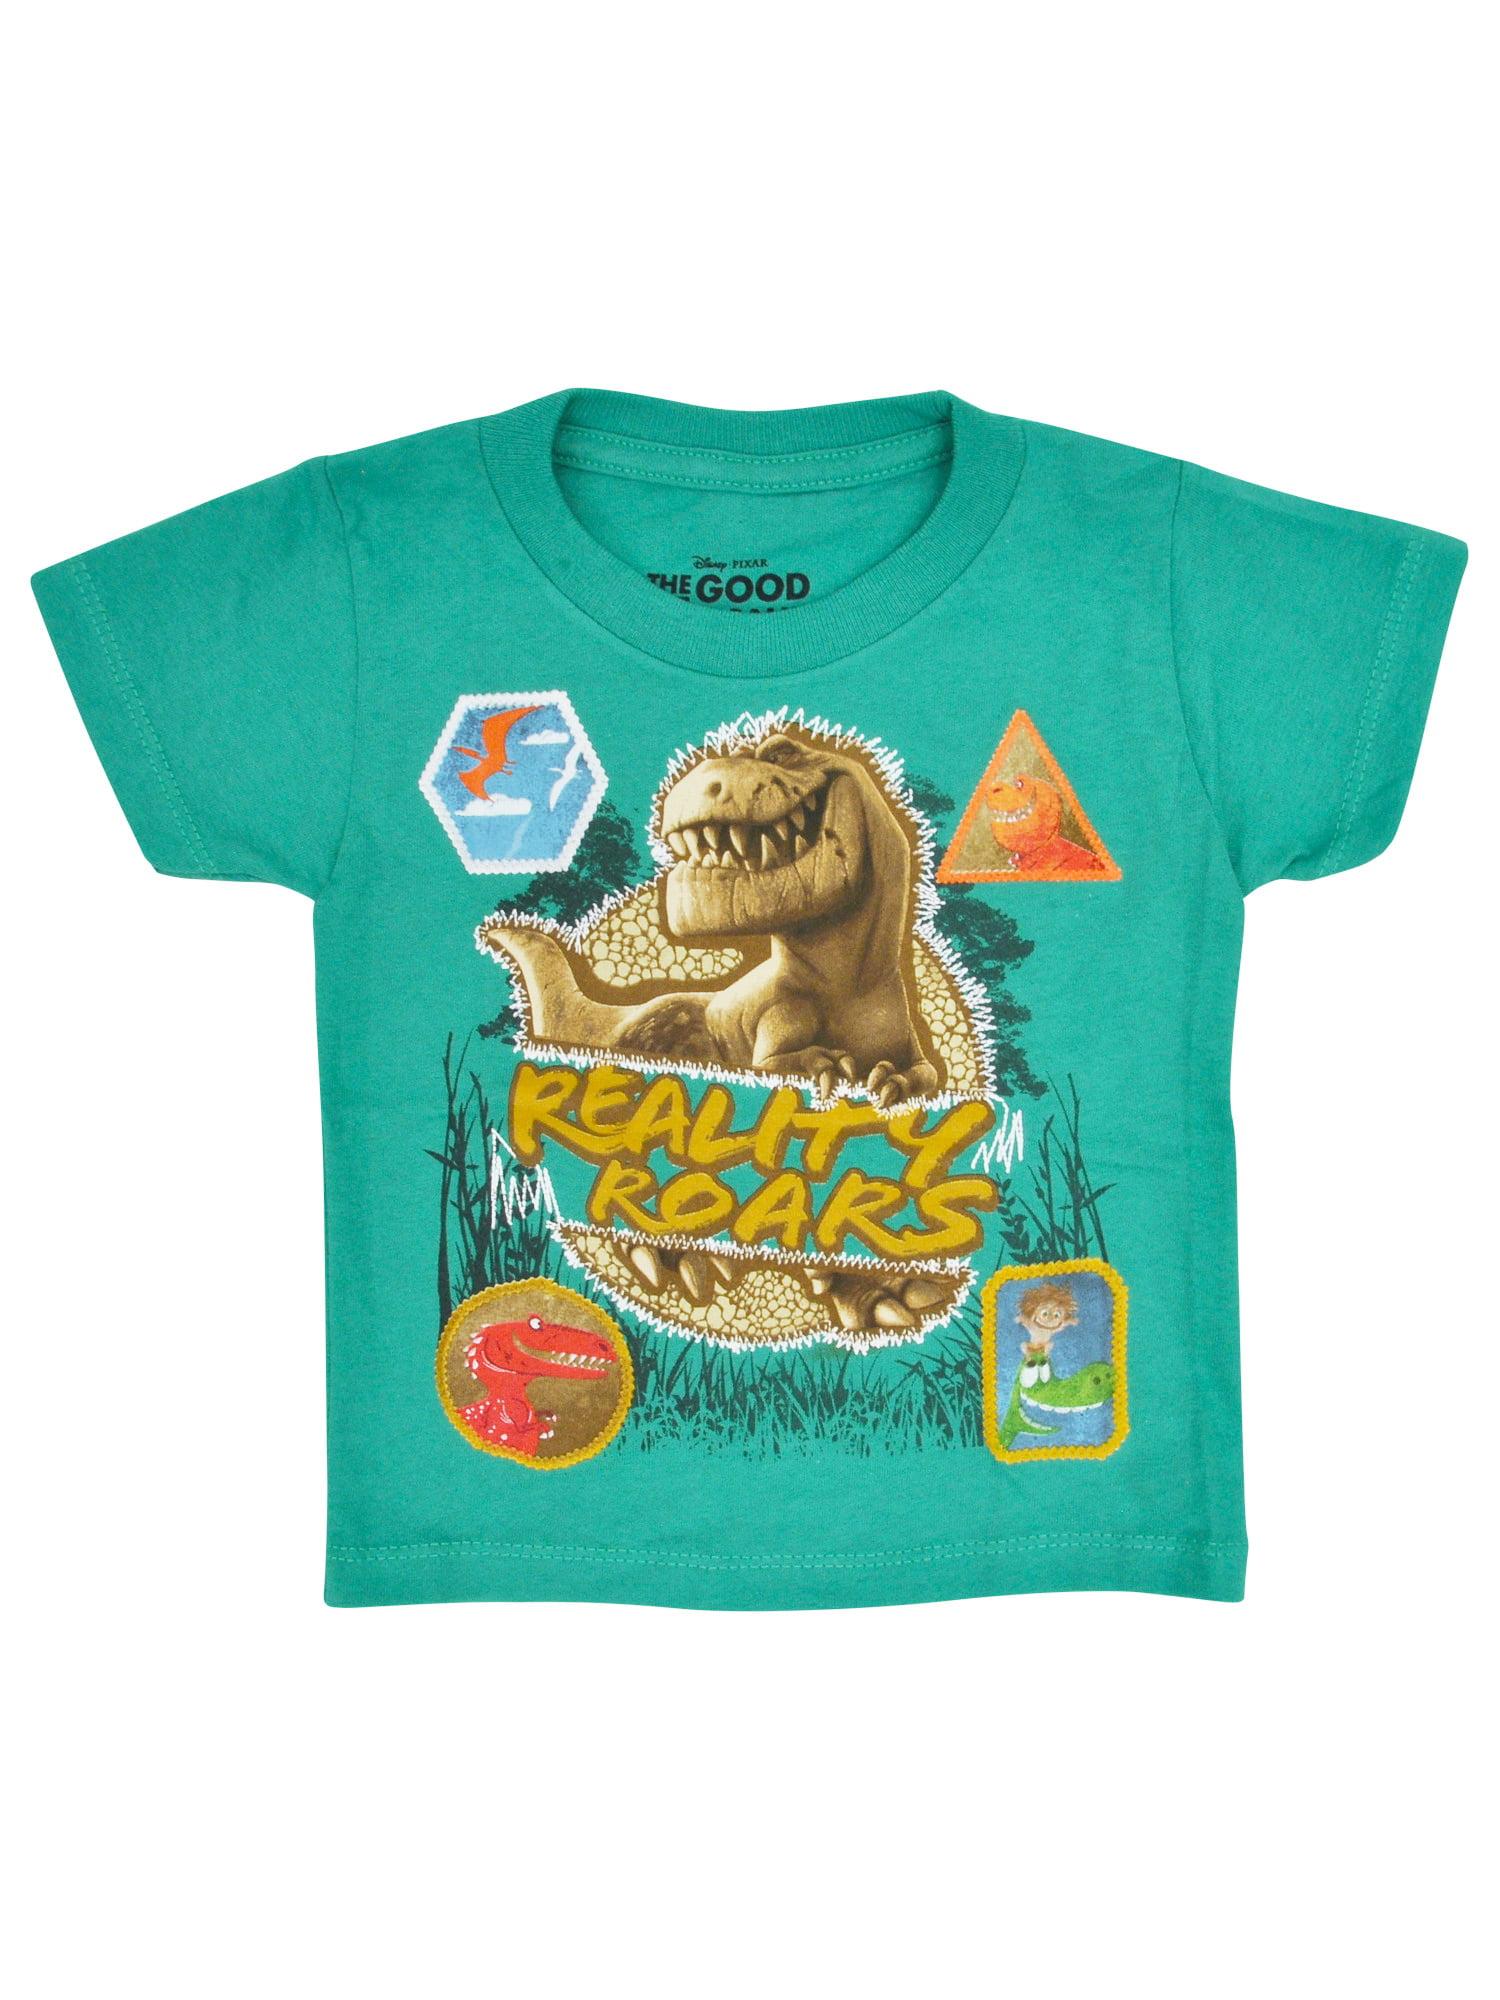 Toddler Boys The Good Dinosaur T-Shirt - Short Sleeve Green